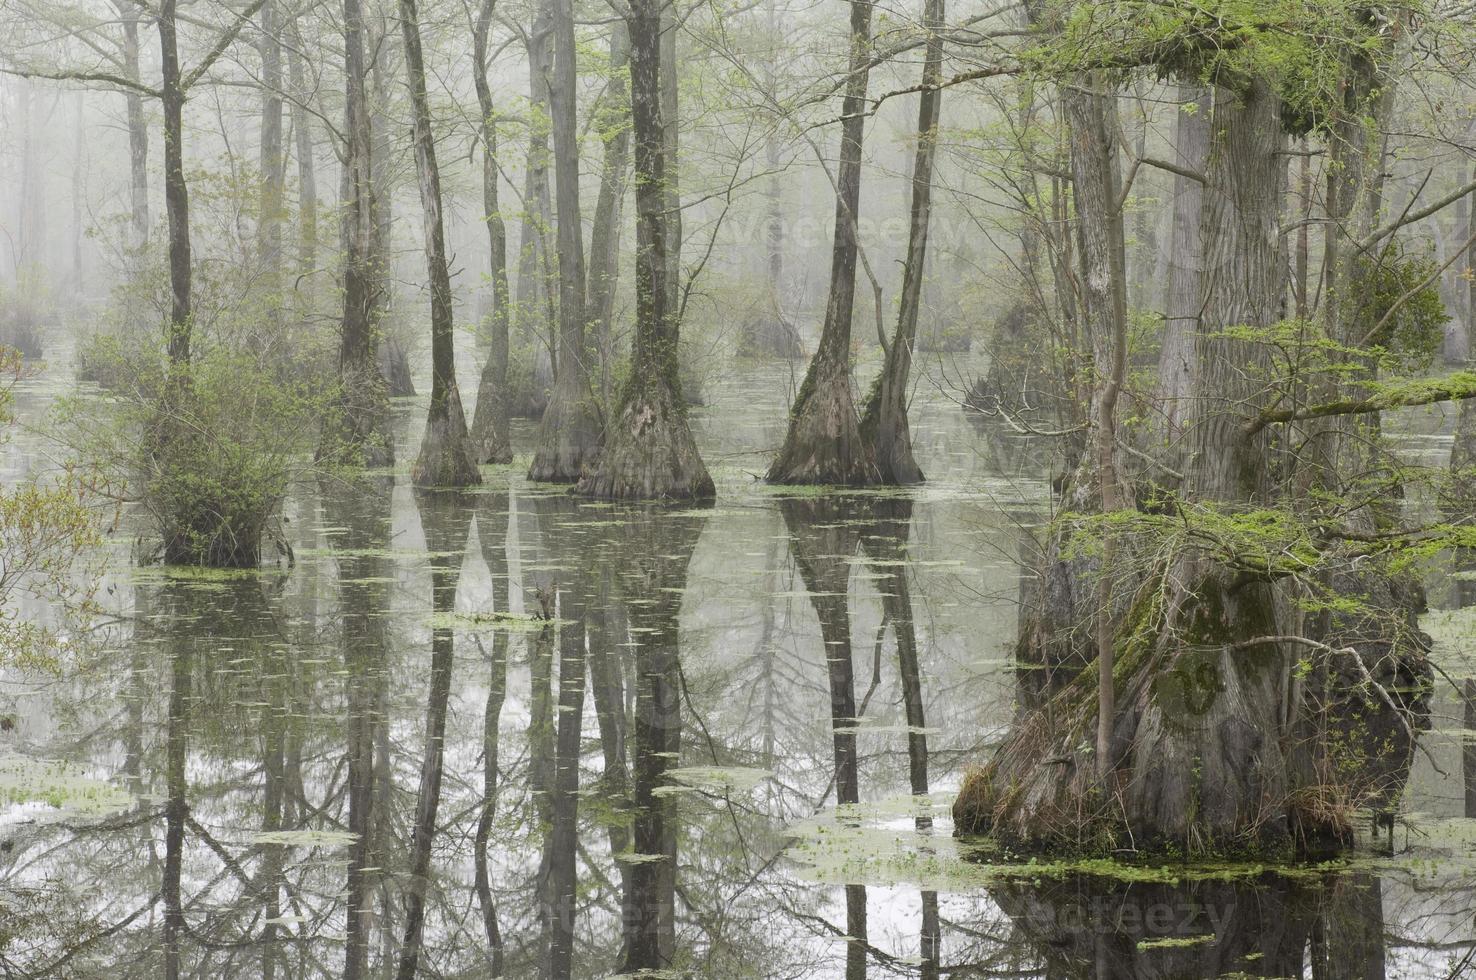 Cypress swamp photo